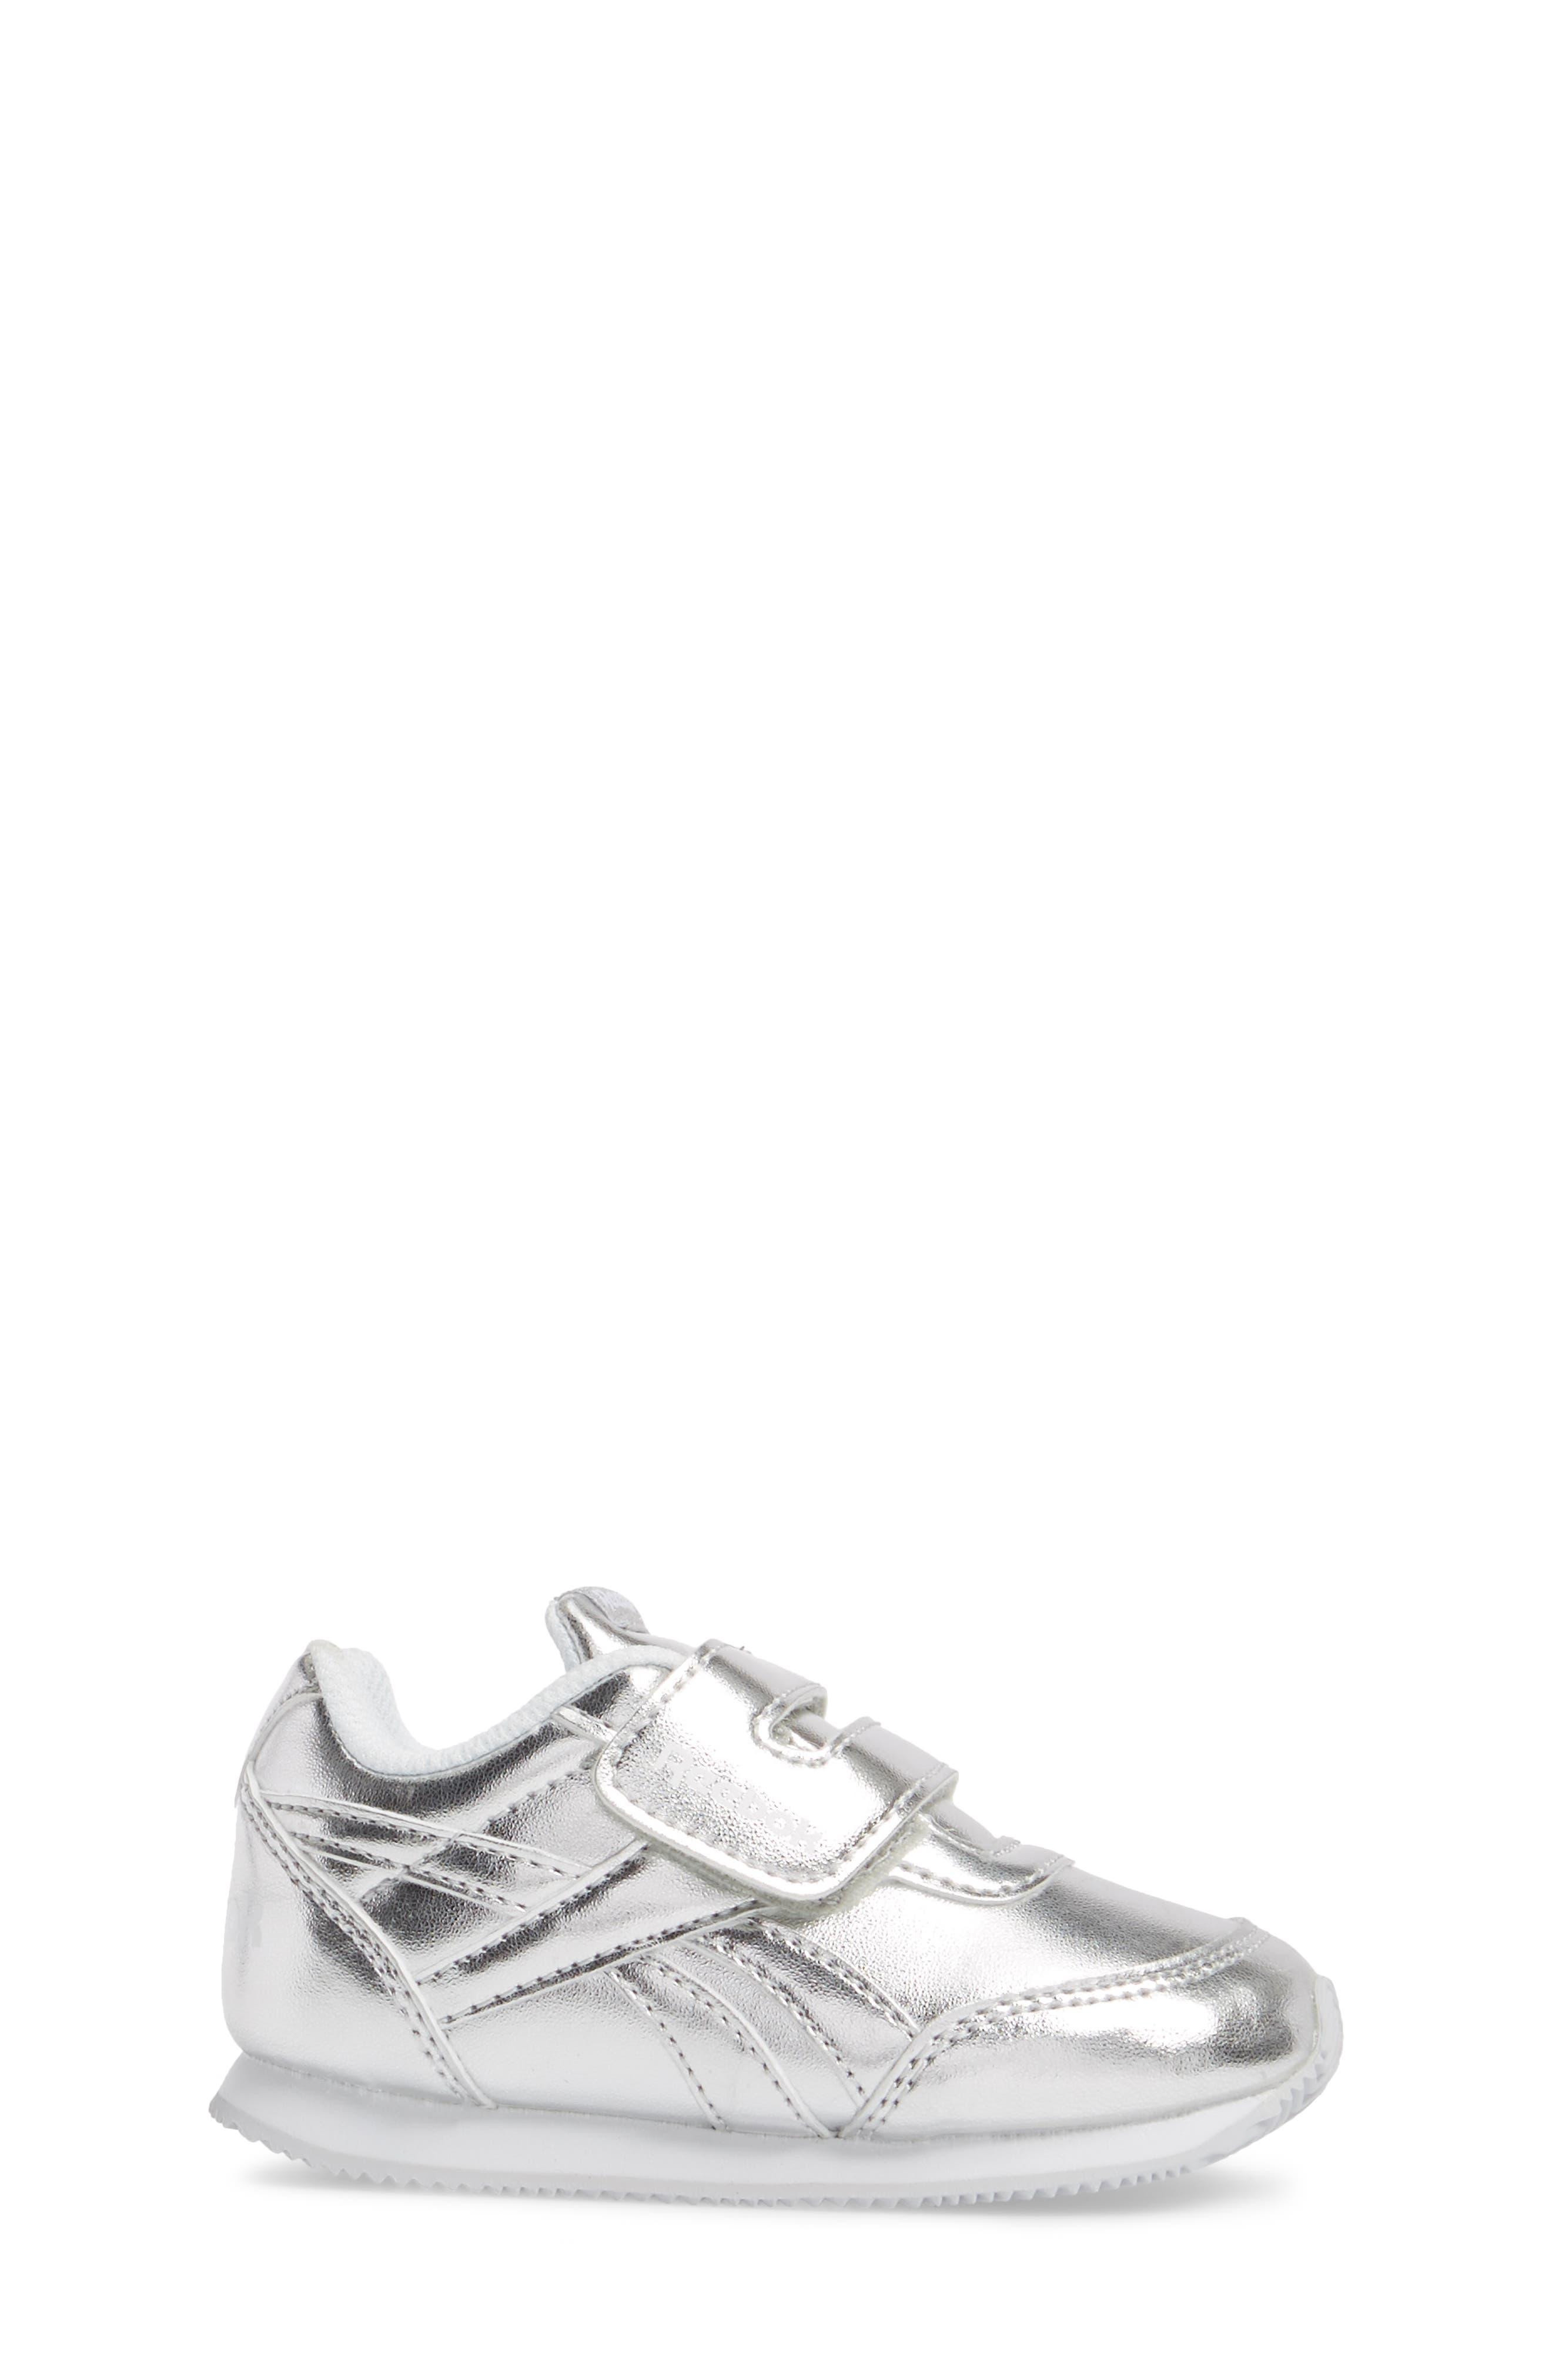 Royal Classic Jogger 2 Sneaker,                             Alternate thumbnail 3, color,                             040